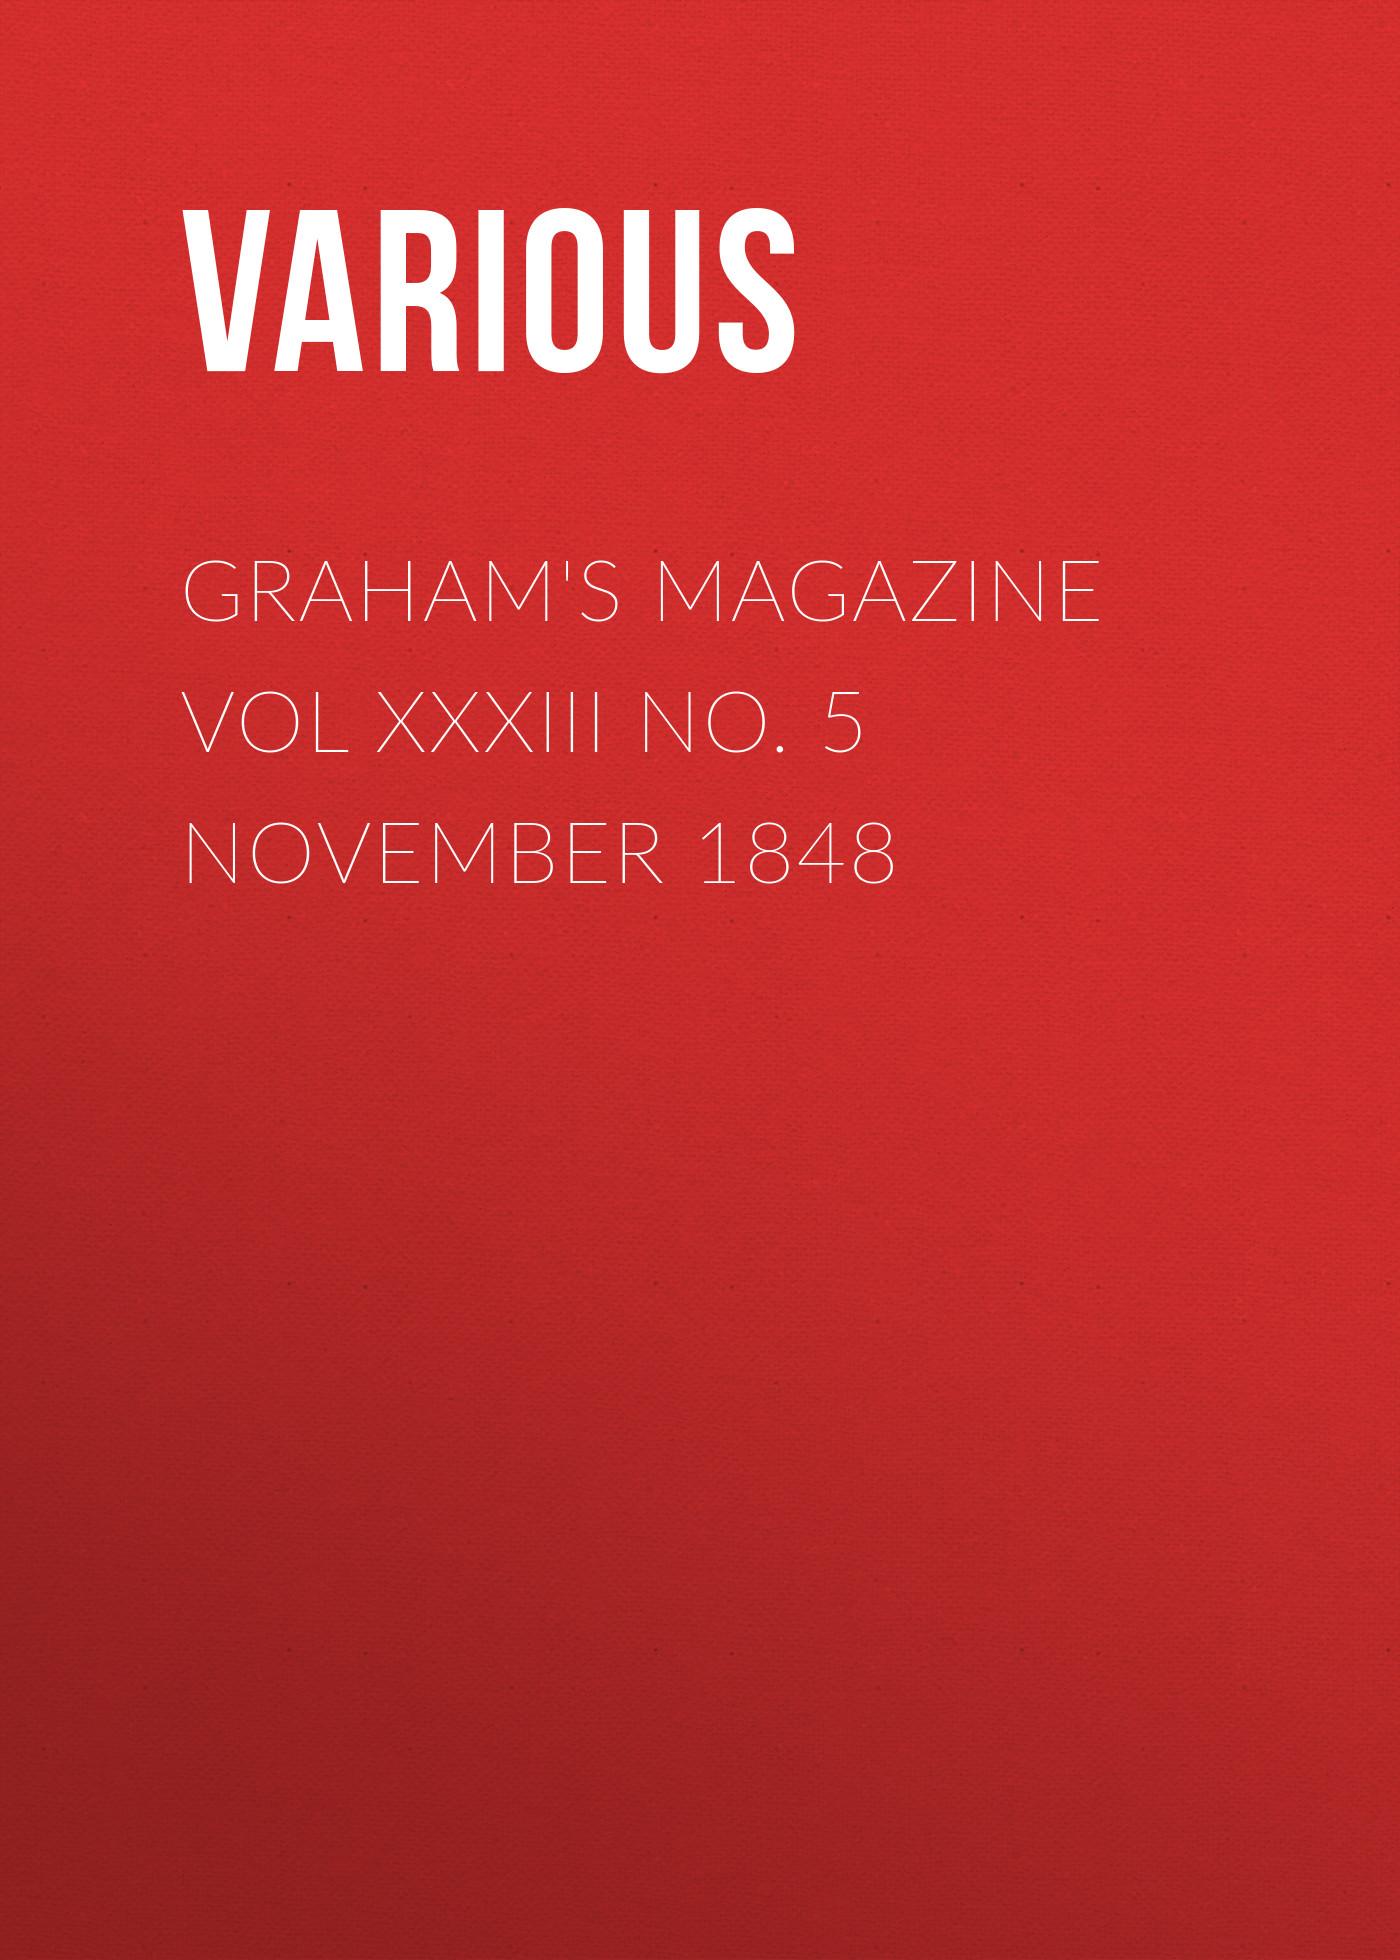 Various Graham's Magazine Vol XXXIII No. 5 November 1848 calendar november 2015